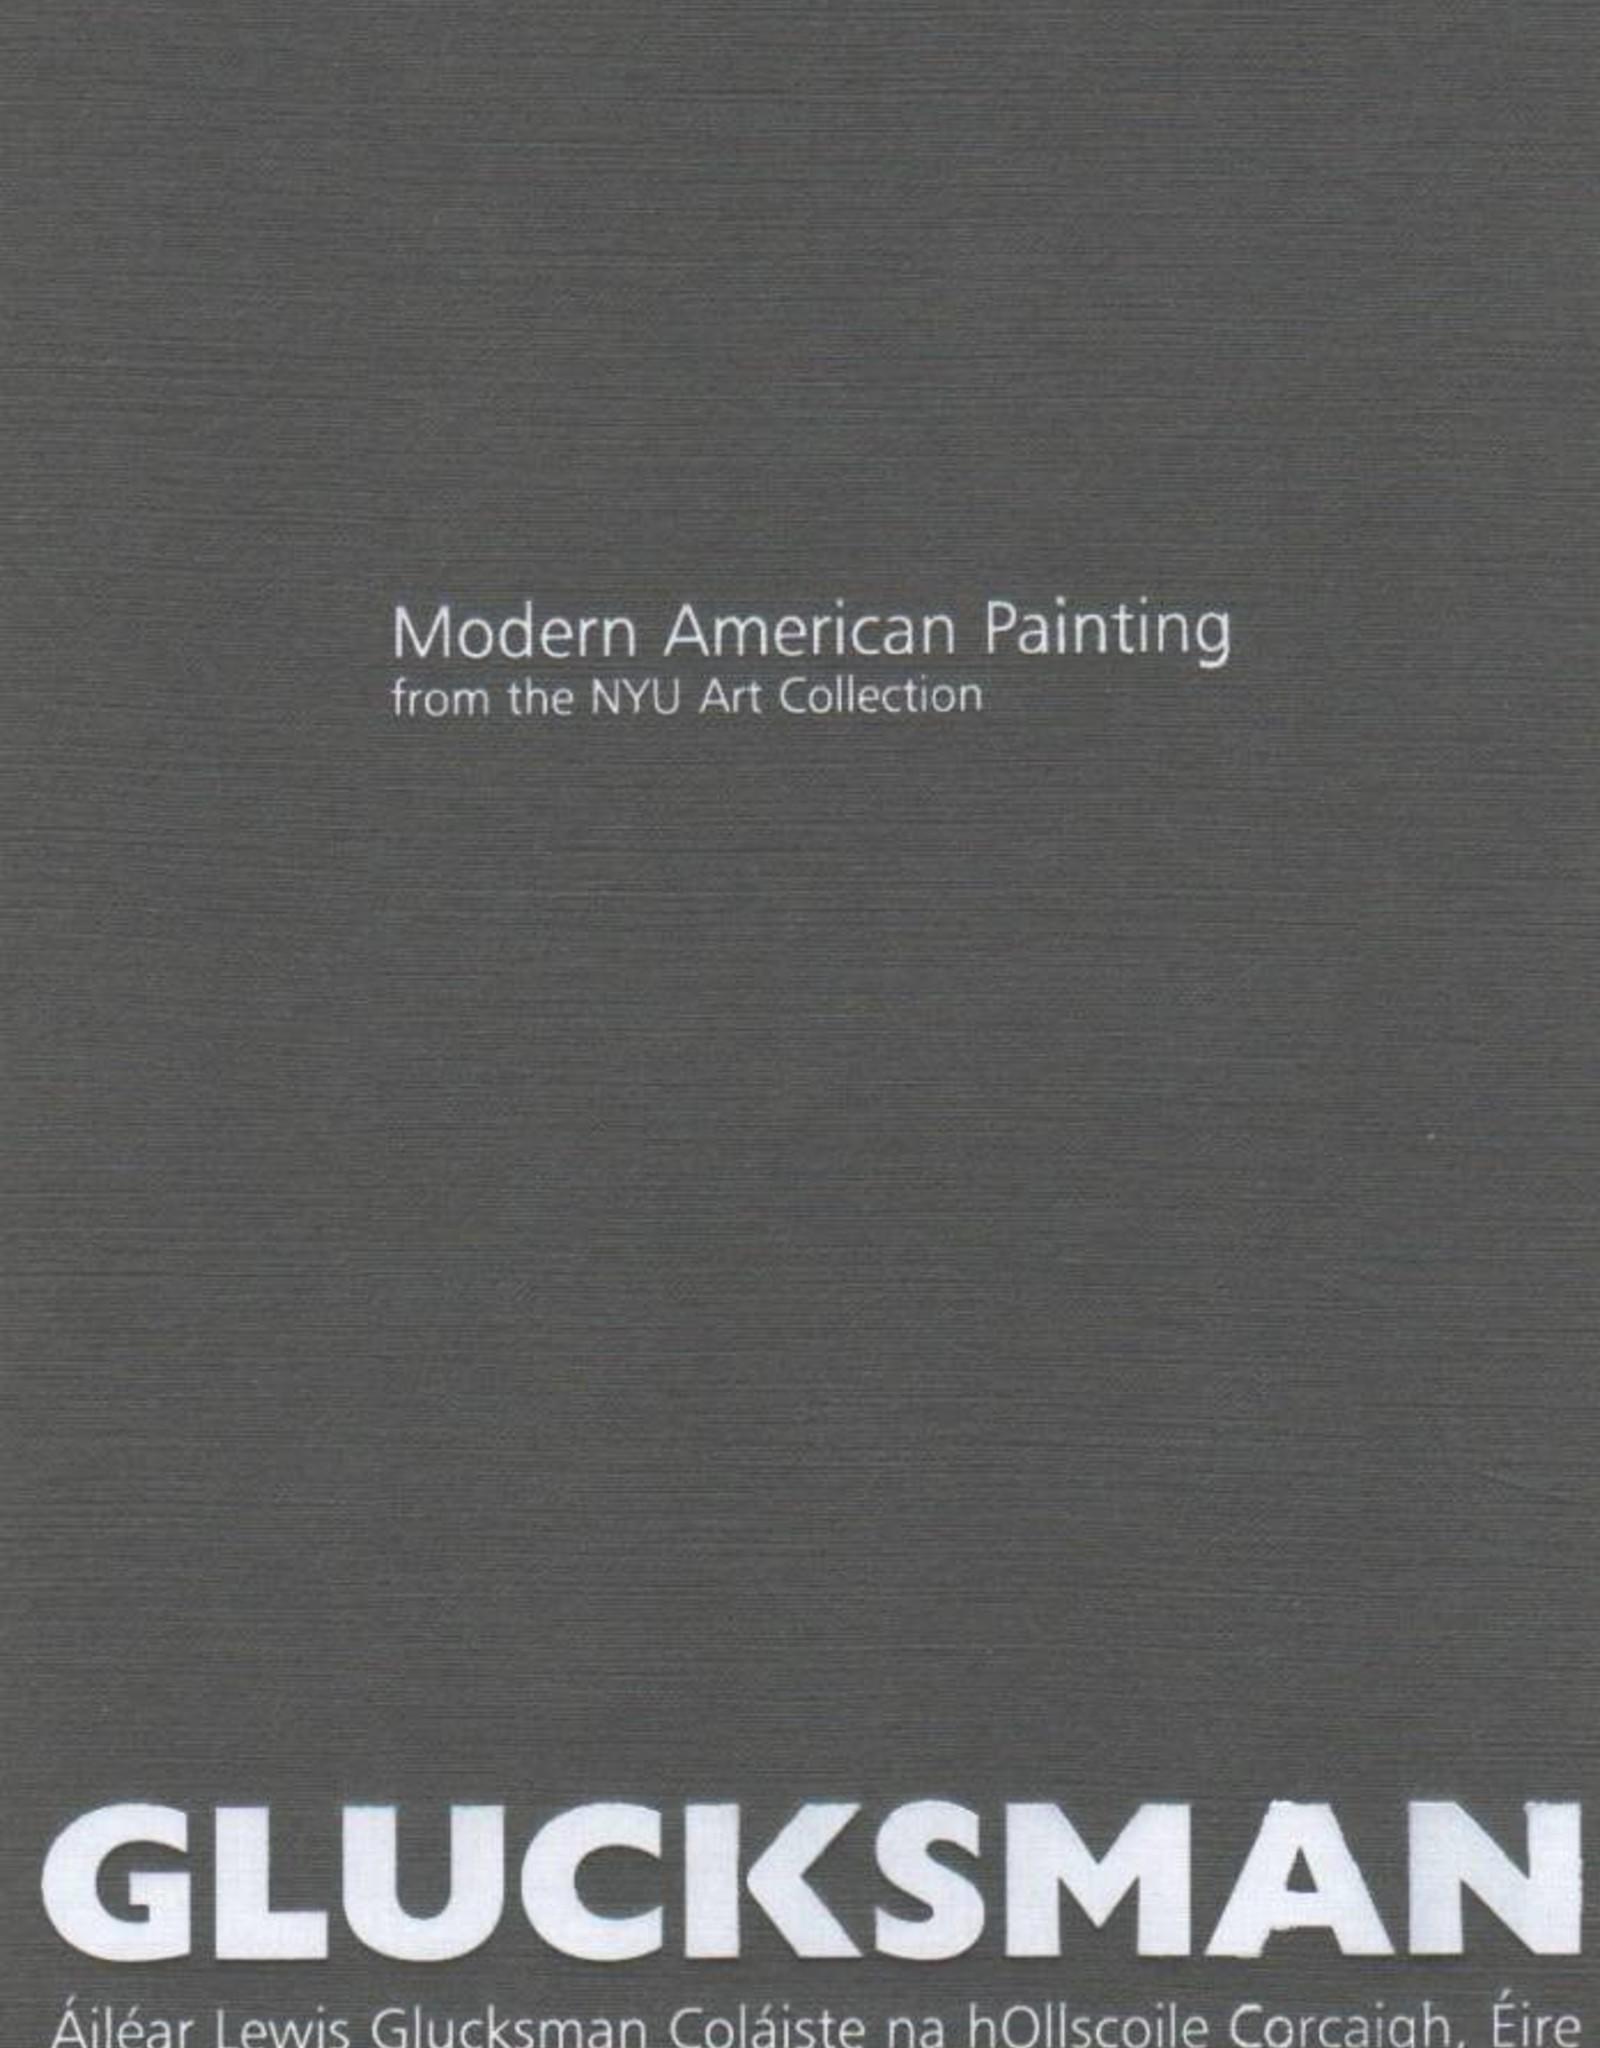 The Glucksman Modern American Painting